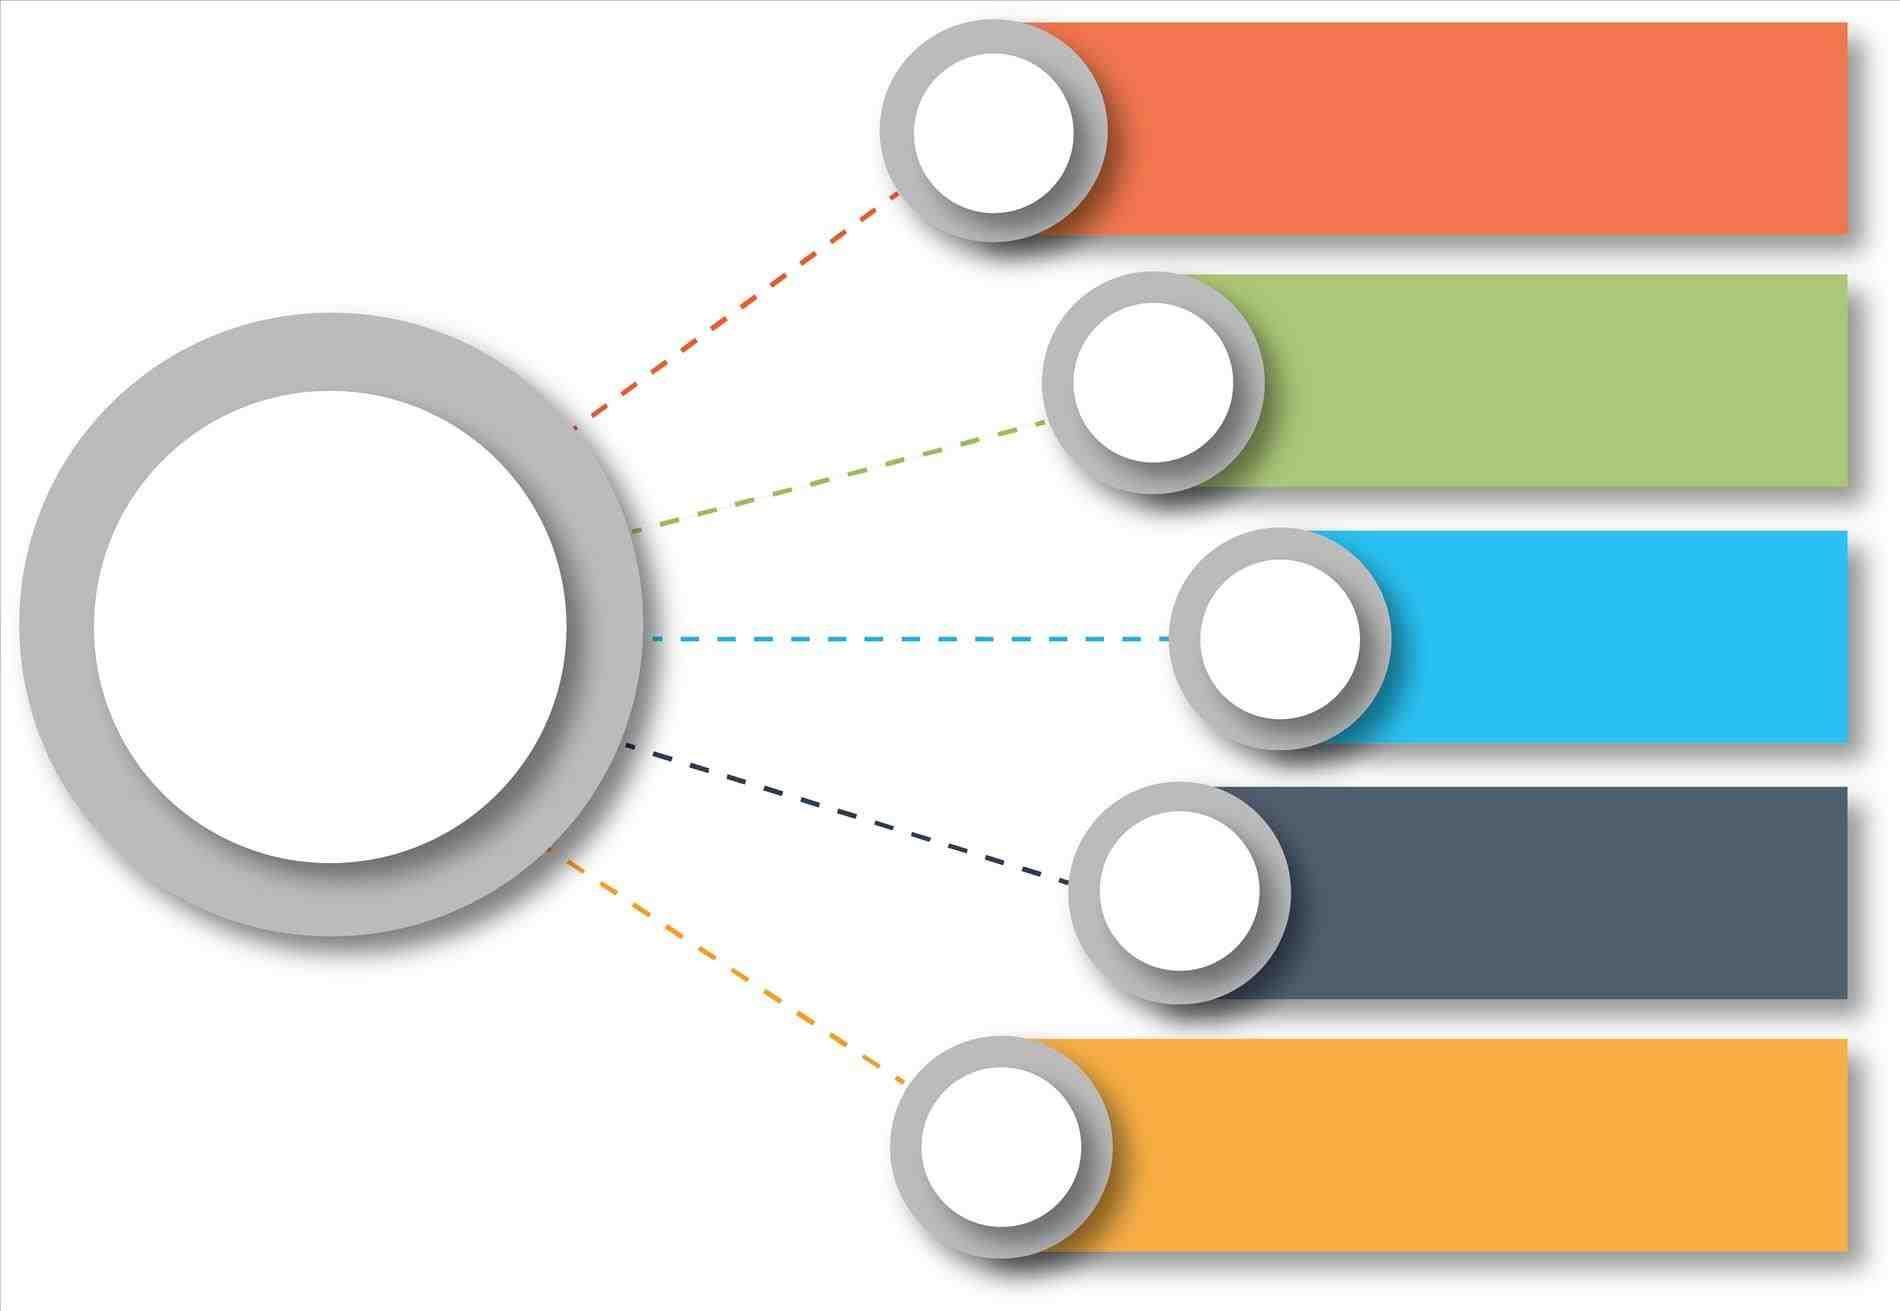 Download Prezi Templates For Powerpoint Your Free Prezi Template Themes Insssrenter Prezi Templates Powerpoint Presentation Design Powerpoint Background Design